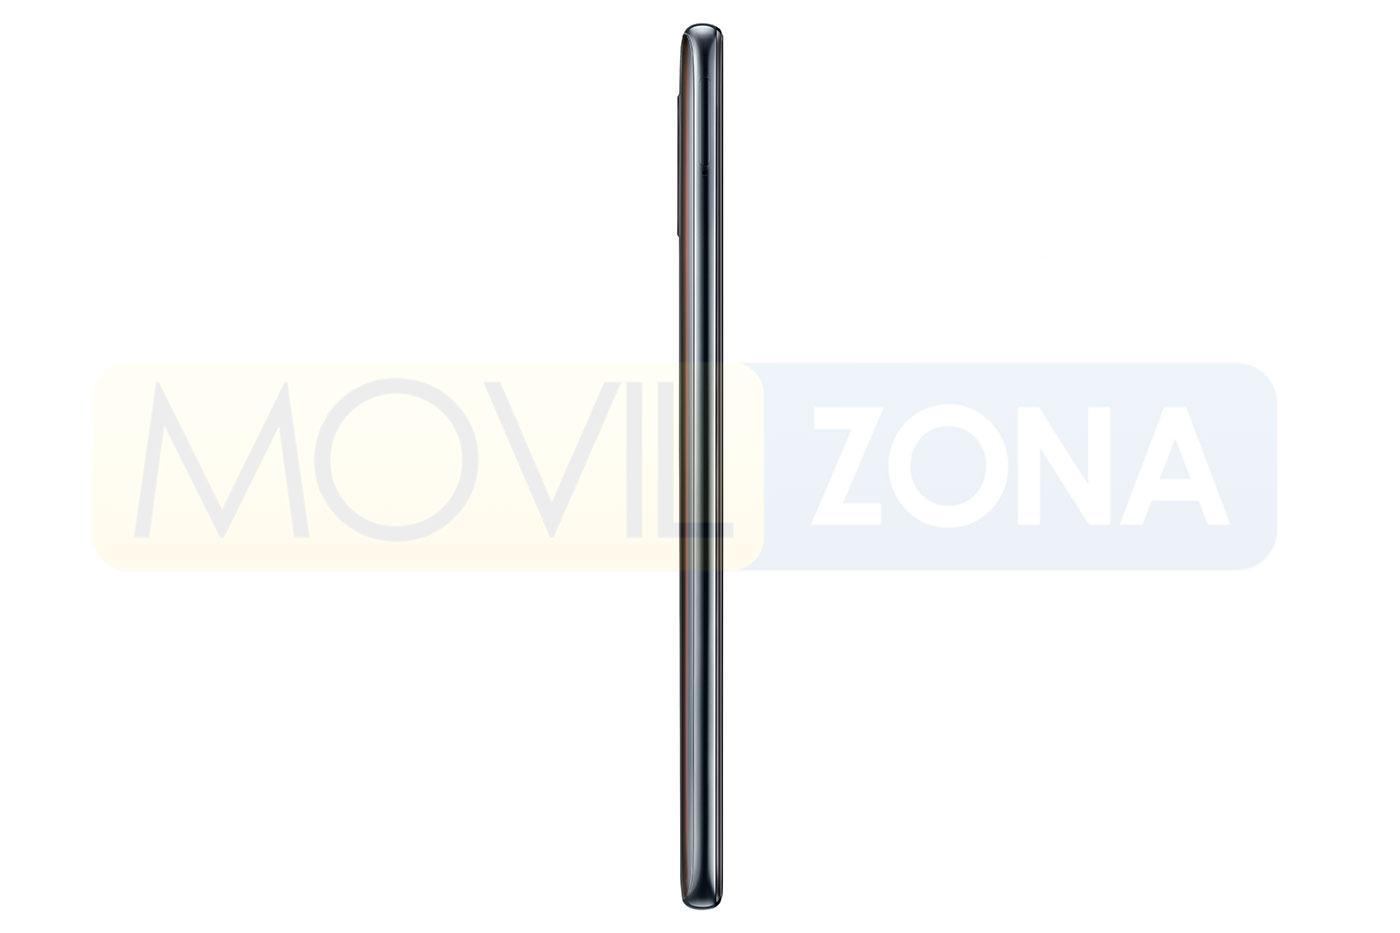 Samsung Galaxy A70 perfil